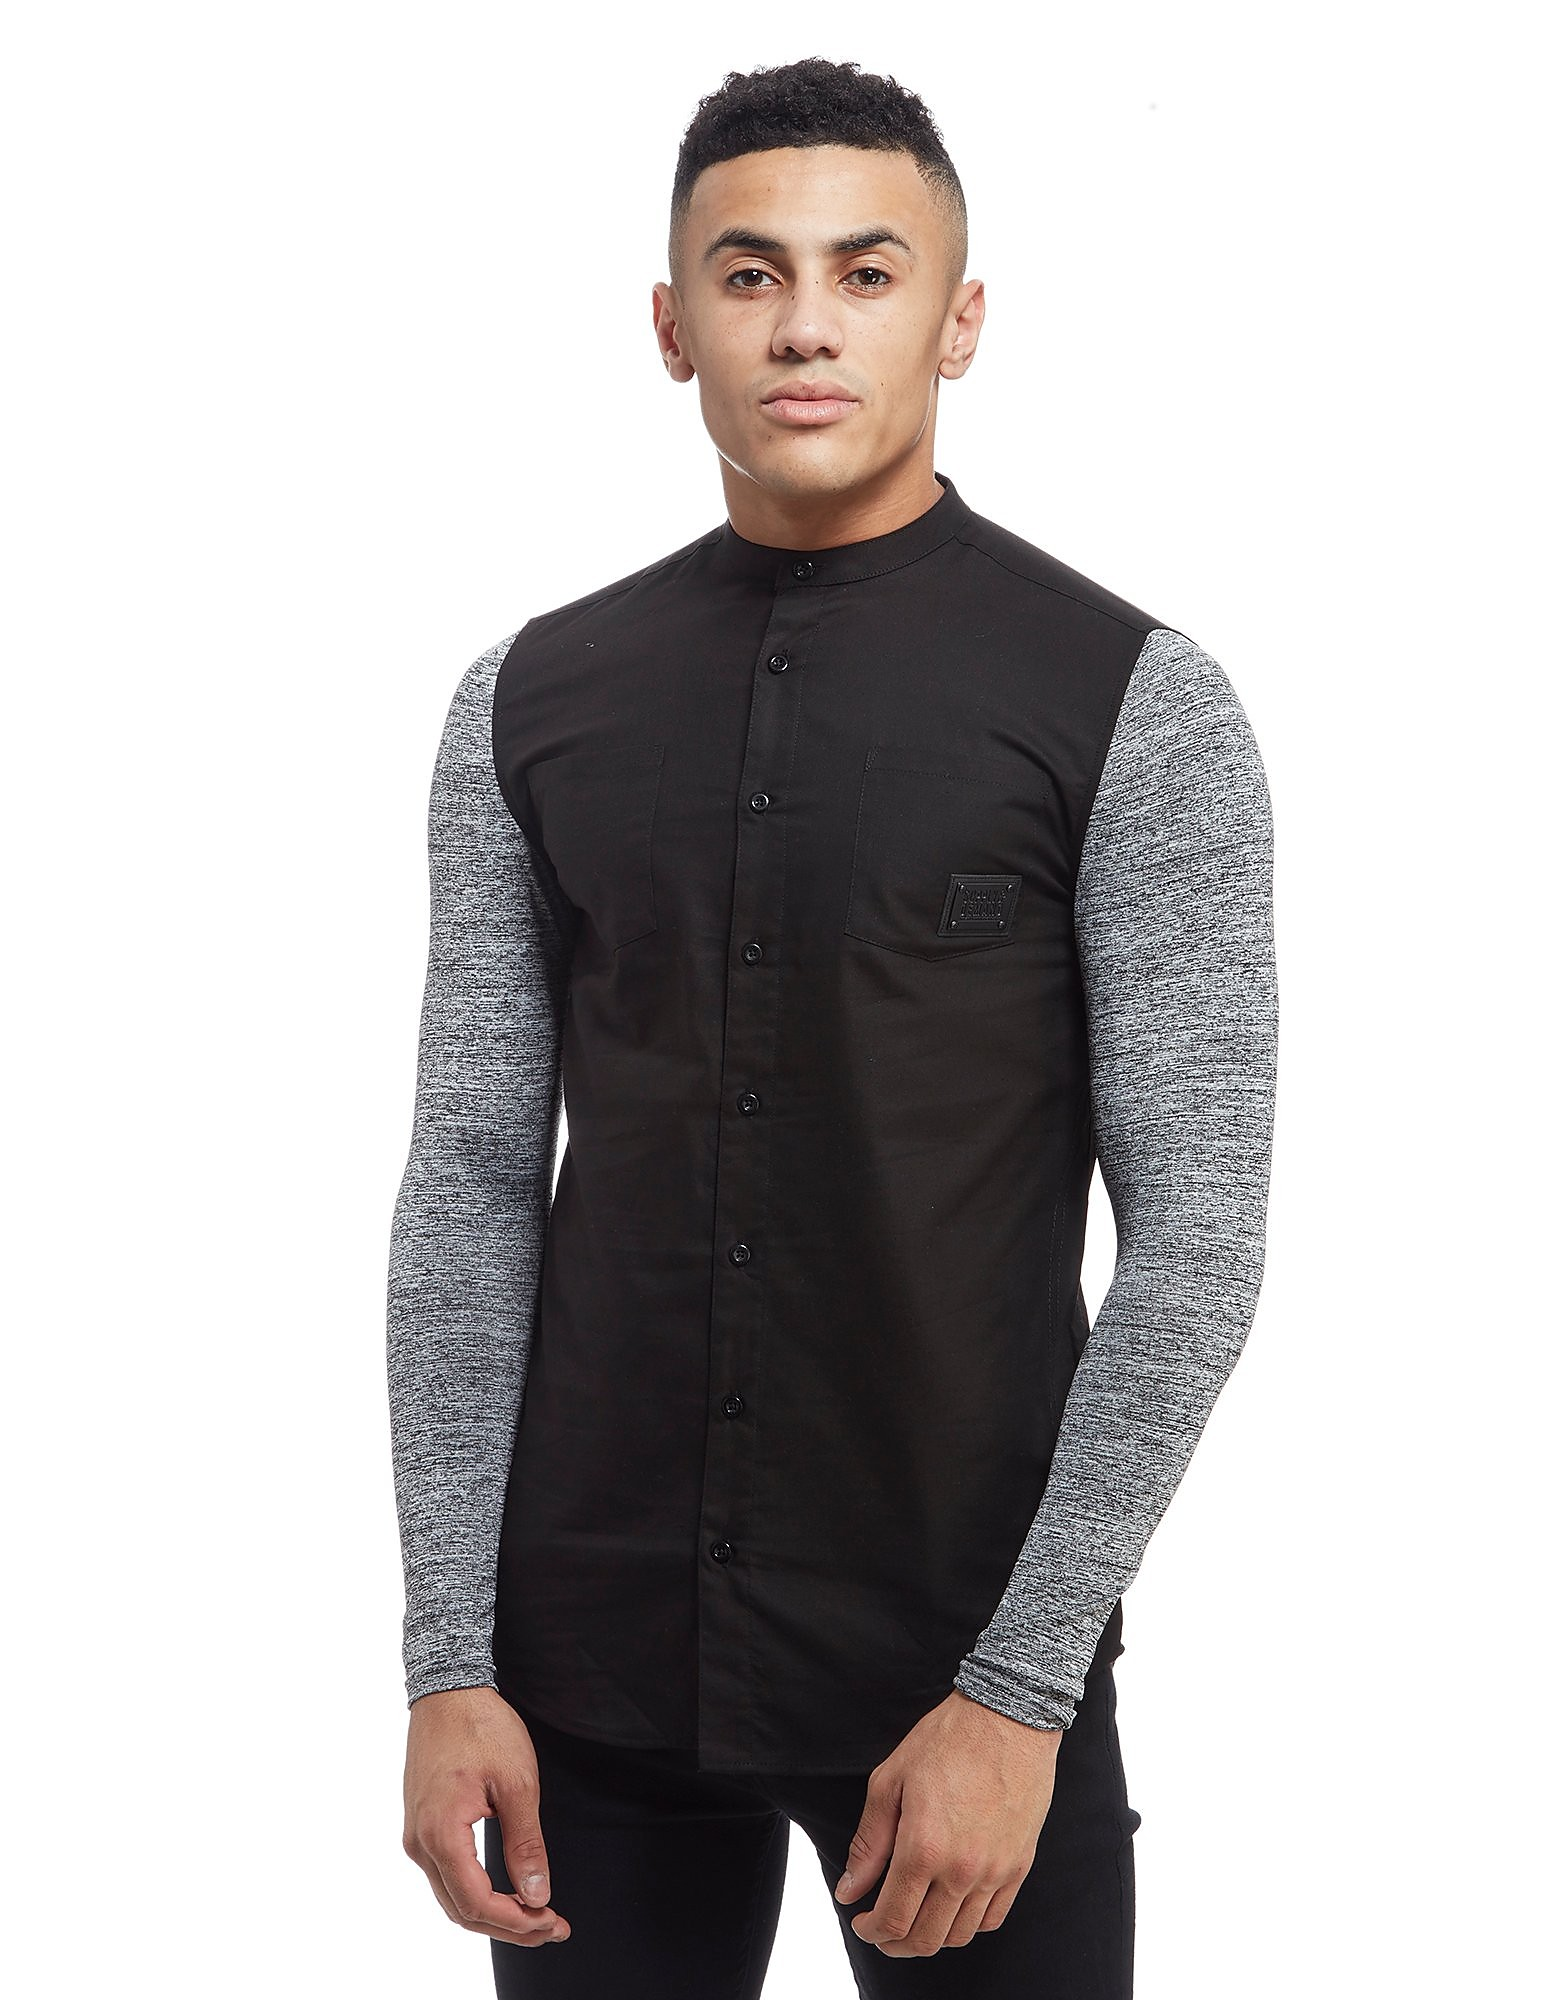 Supply & Demand Space Long Sleeve Shirt